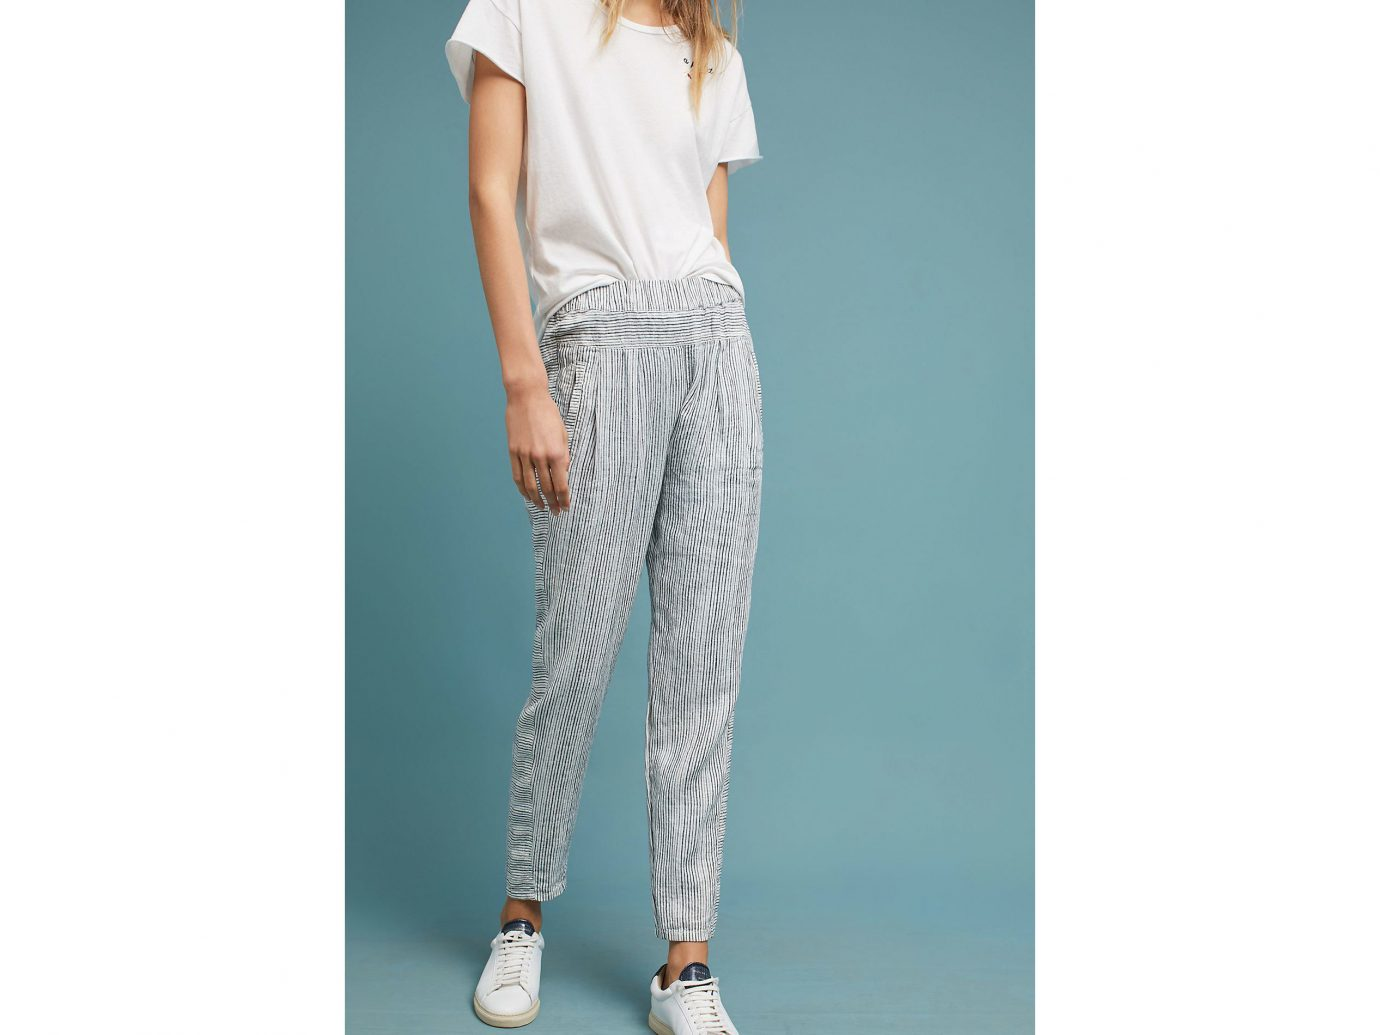 Style + Design Travel Shop clothing white person waist fashion model standing trunk abdomen trousers jeans one piece garment joint shoe neck trouser pocket